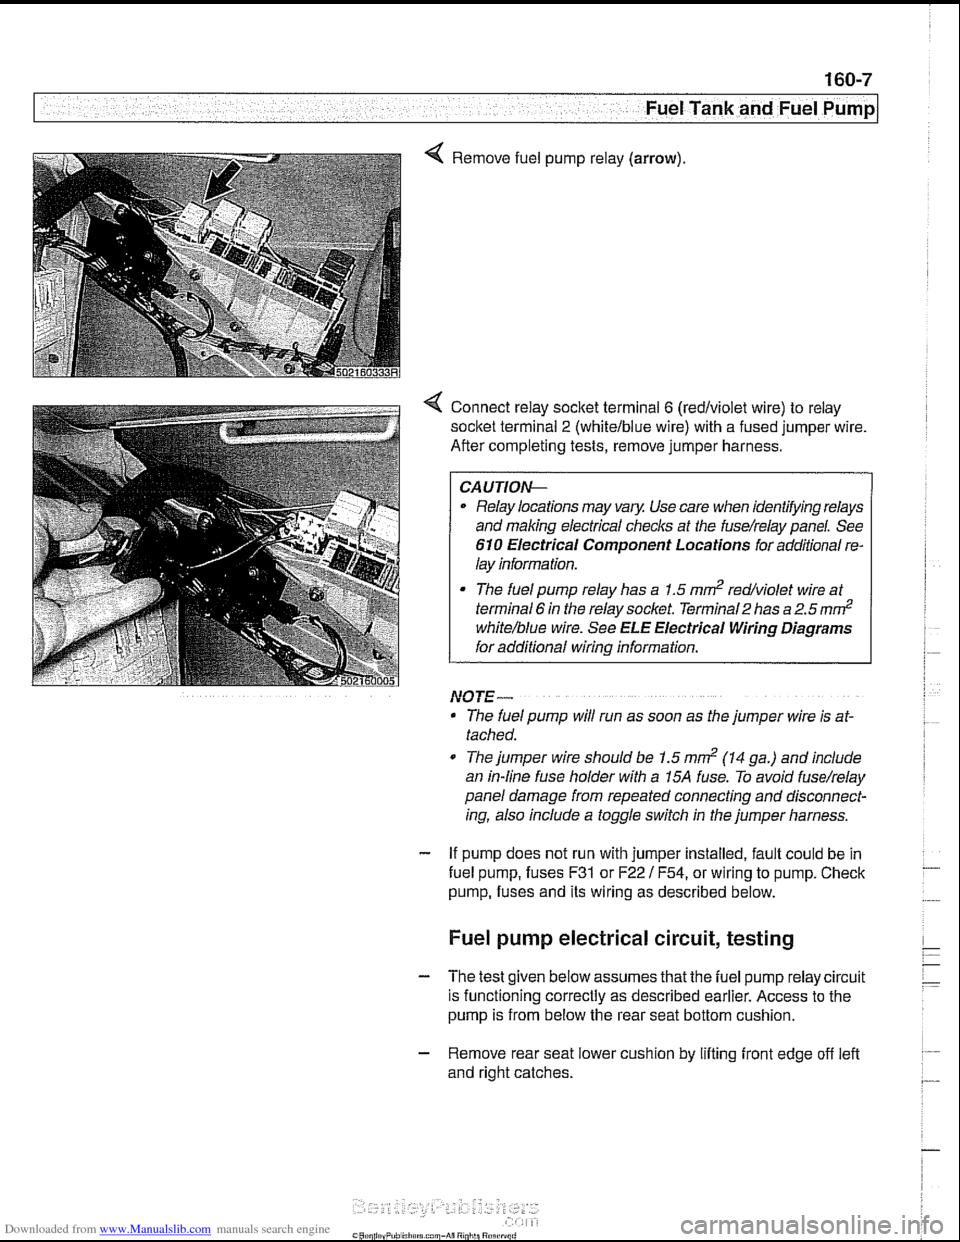 Fuses Bmw 525i 2000 E39 Workshop Manual Fuel Pump Wire Diagram Page 477